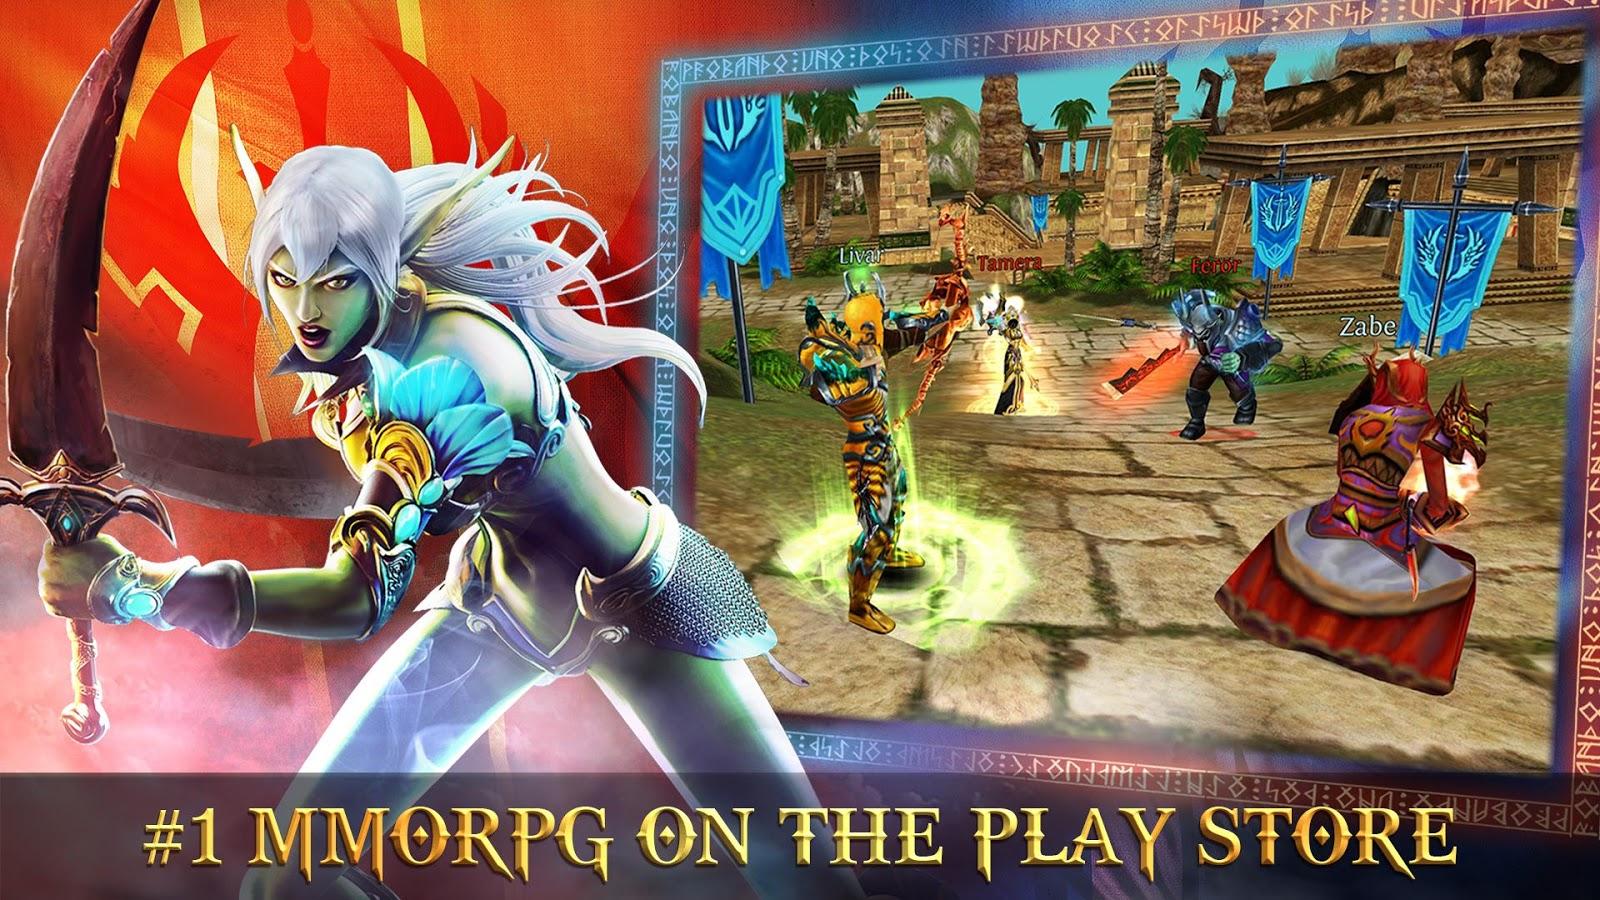 Order Chaos Online Game Apps For Laptop Pc Desktop Windows 7 8 10 Mac Os X Mewdiepie